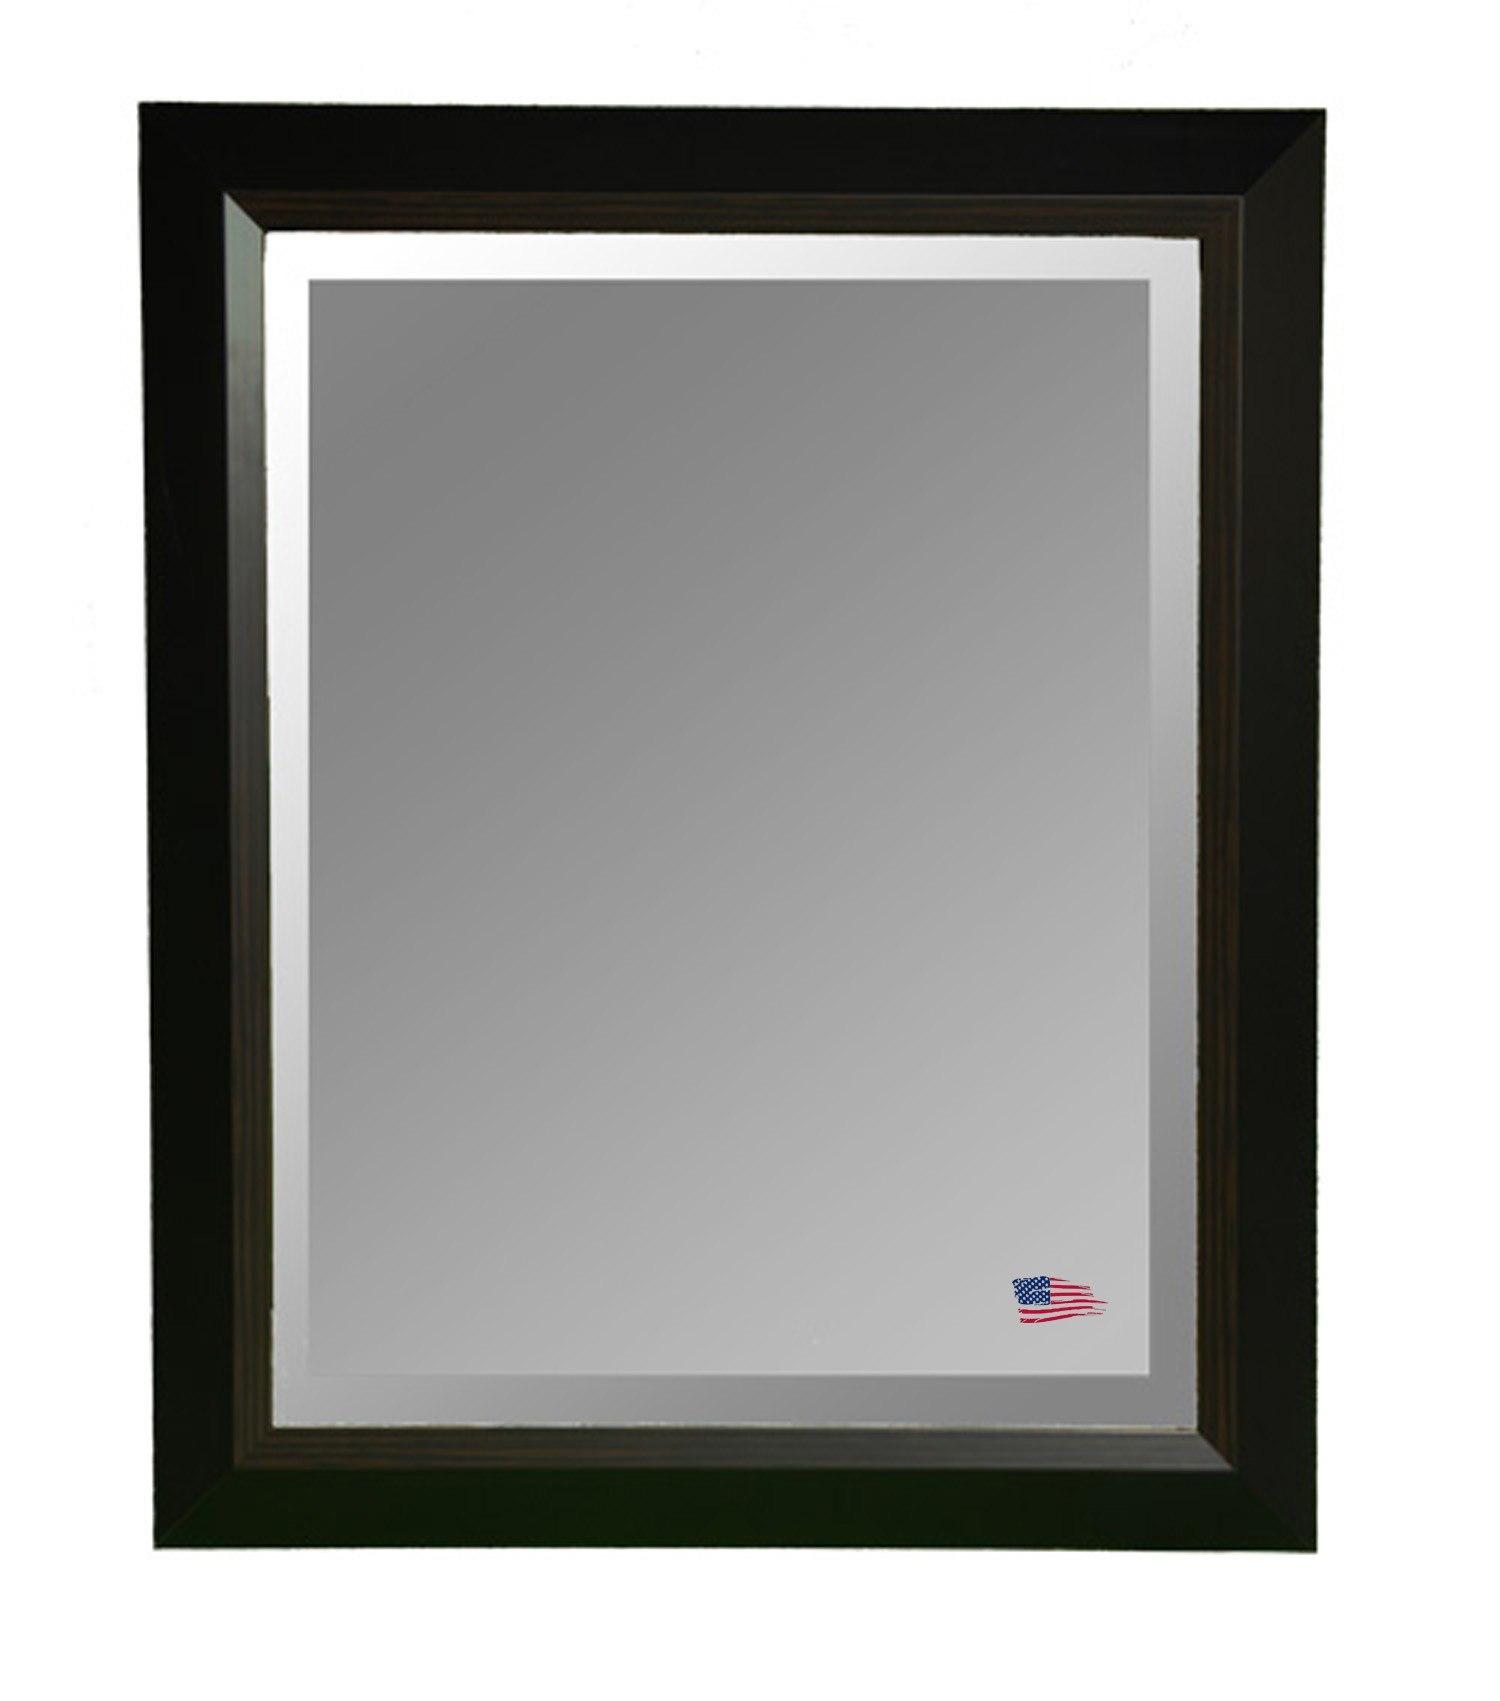 Rayne Mirrors R0011LV 41.75 x 35.75 Inch Brown Linning Wall Mirror